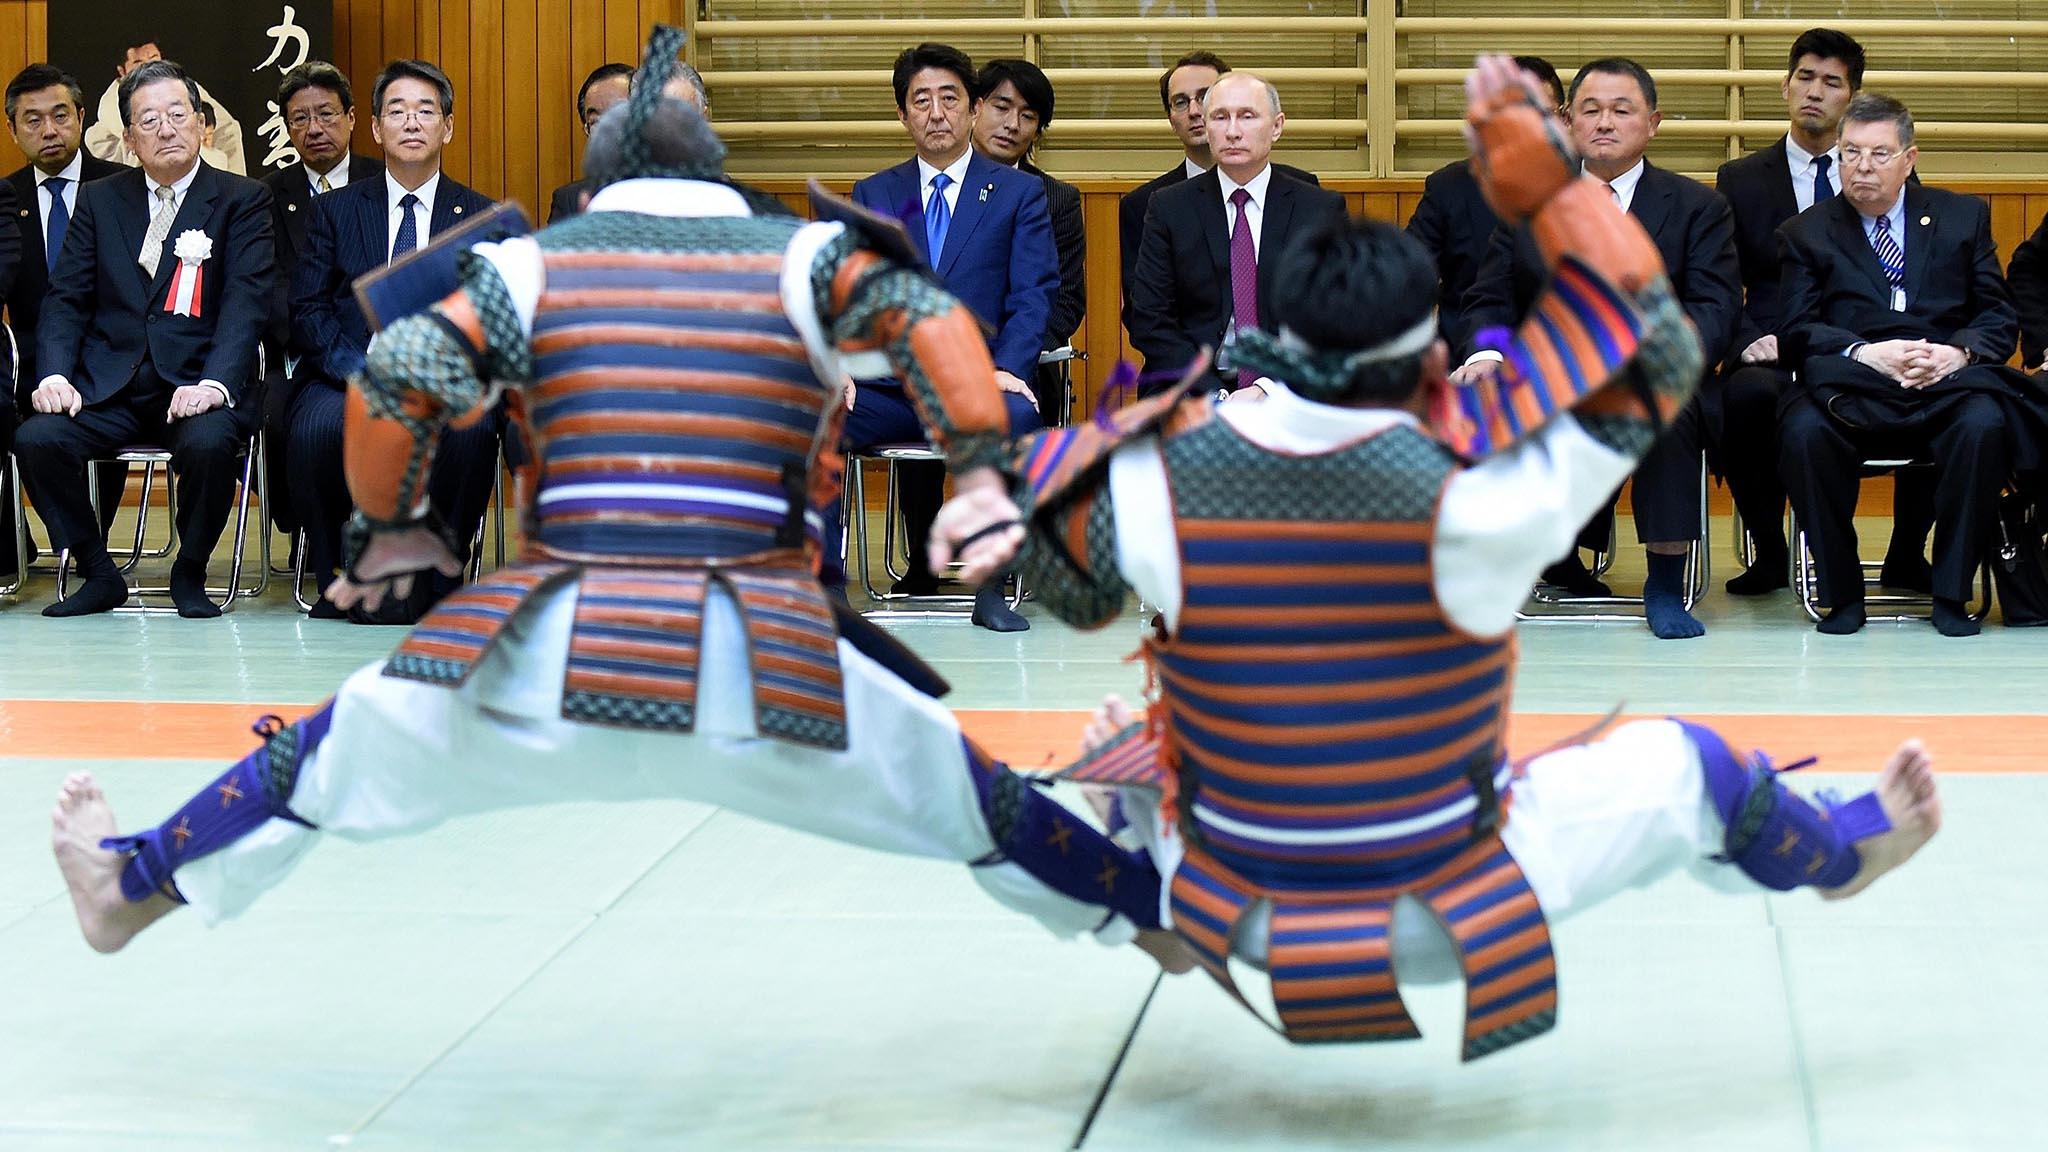 Russian President Vladimir Putin in Japan